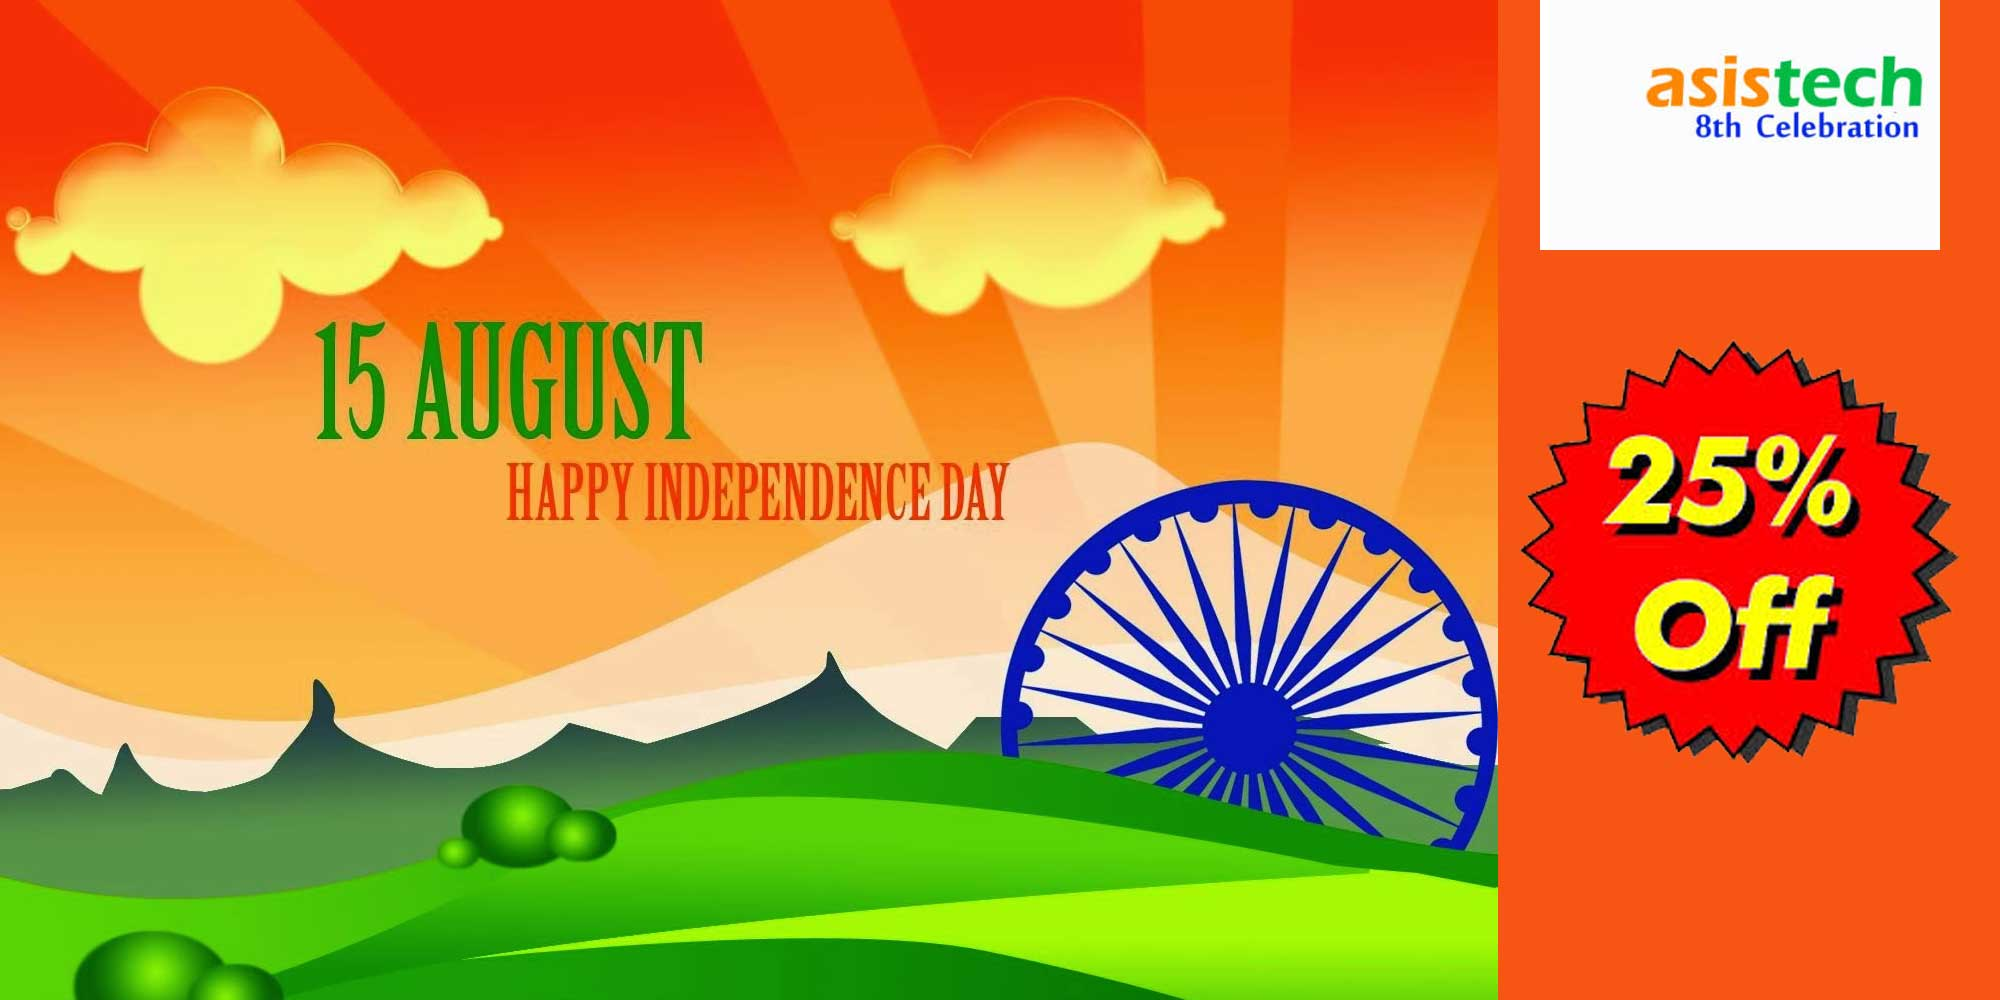 Happy Independenceday